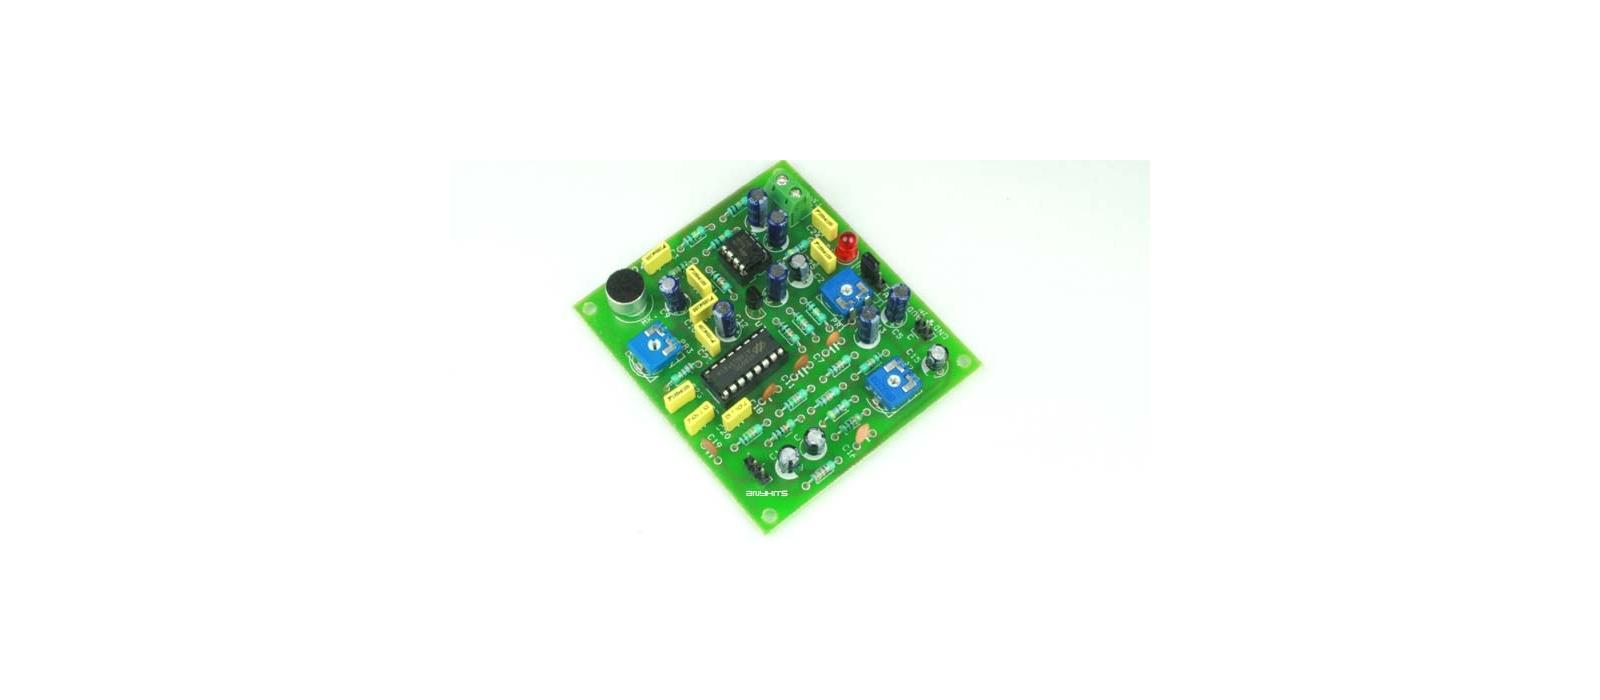 Voice Echo Generator Sound To Converter Circuit Audio Generators Projects Circuits 9 Ideas I Schematics Robotics